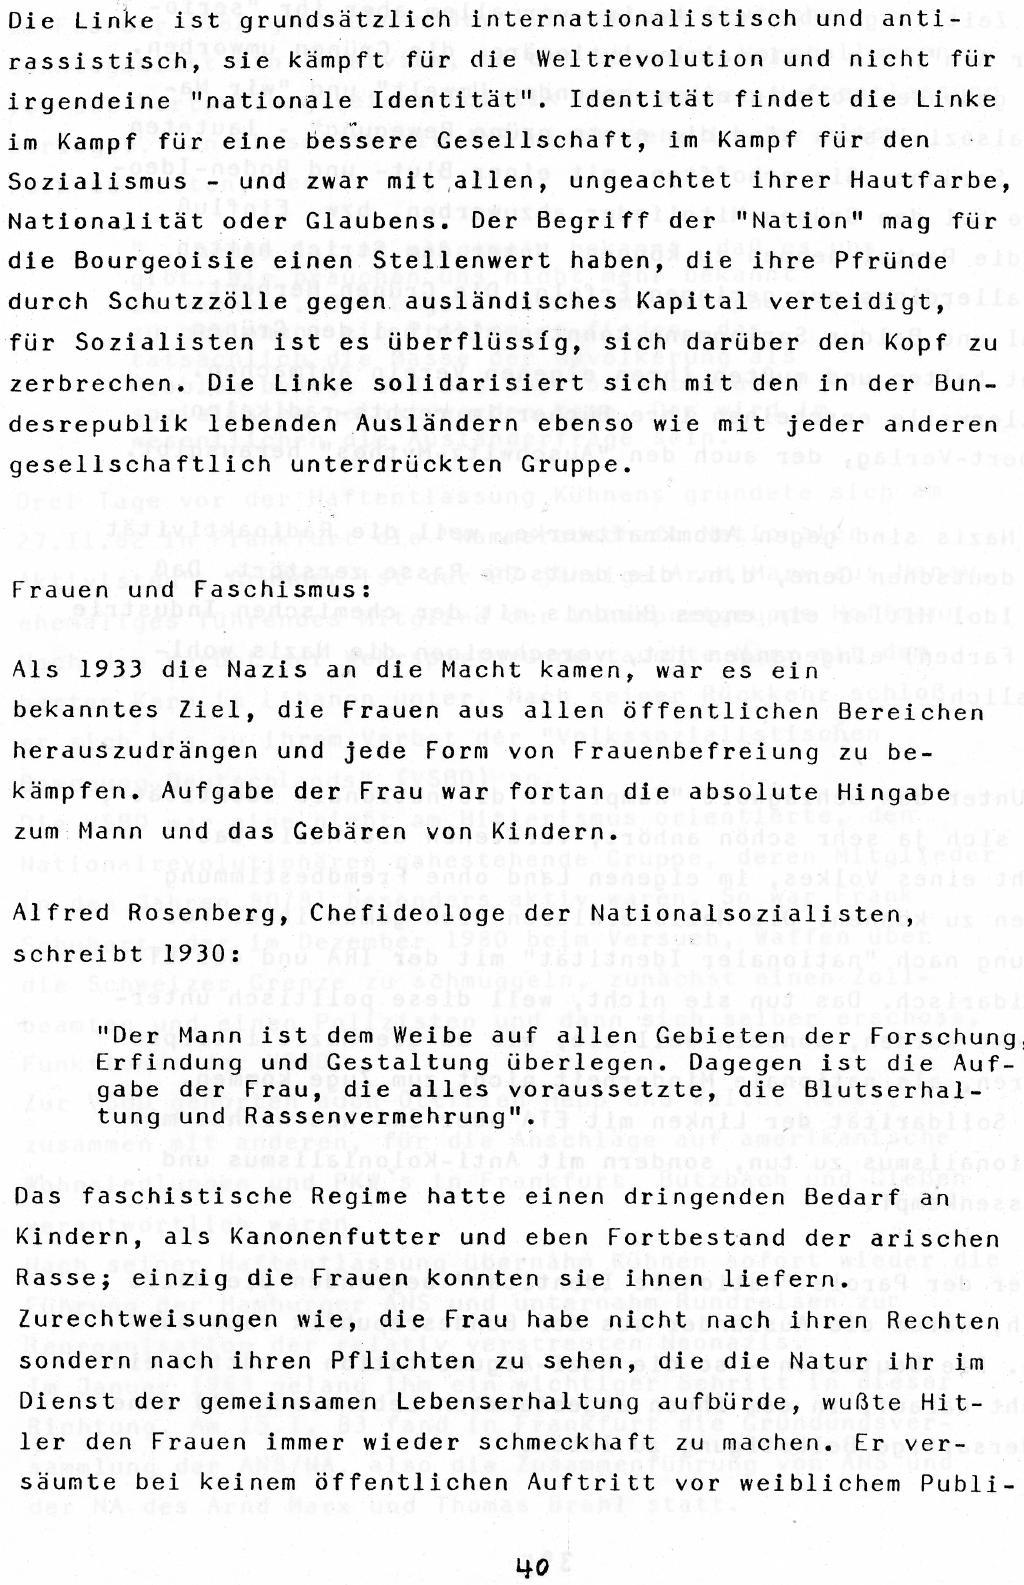 Berlin_1983_Autonome_Gruppen_Faschismus_im_Kapitalismus_40